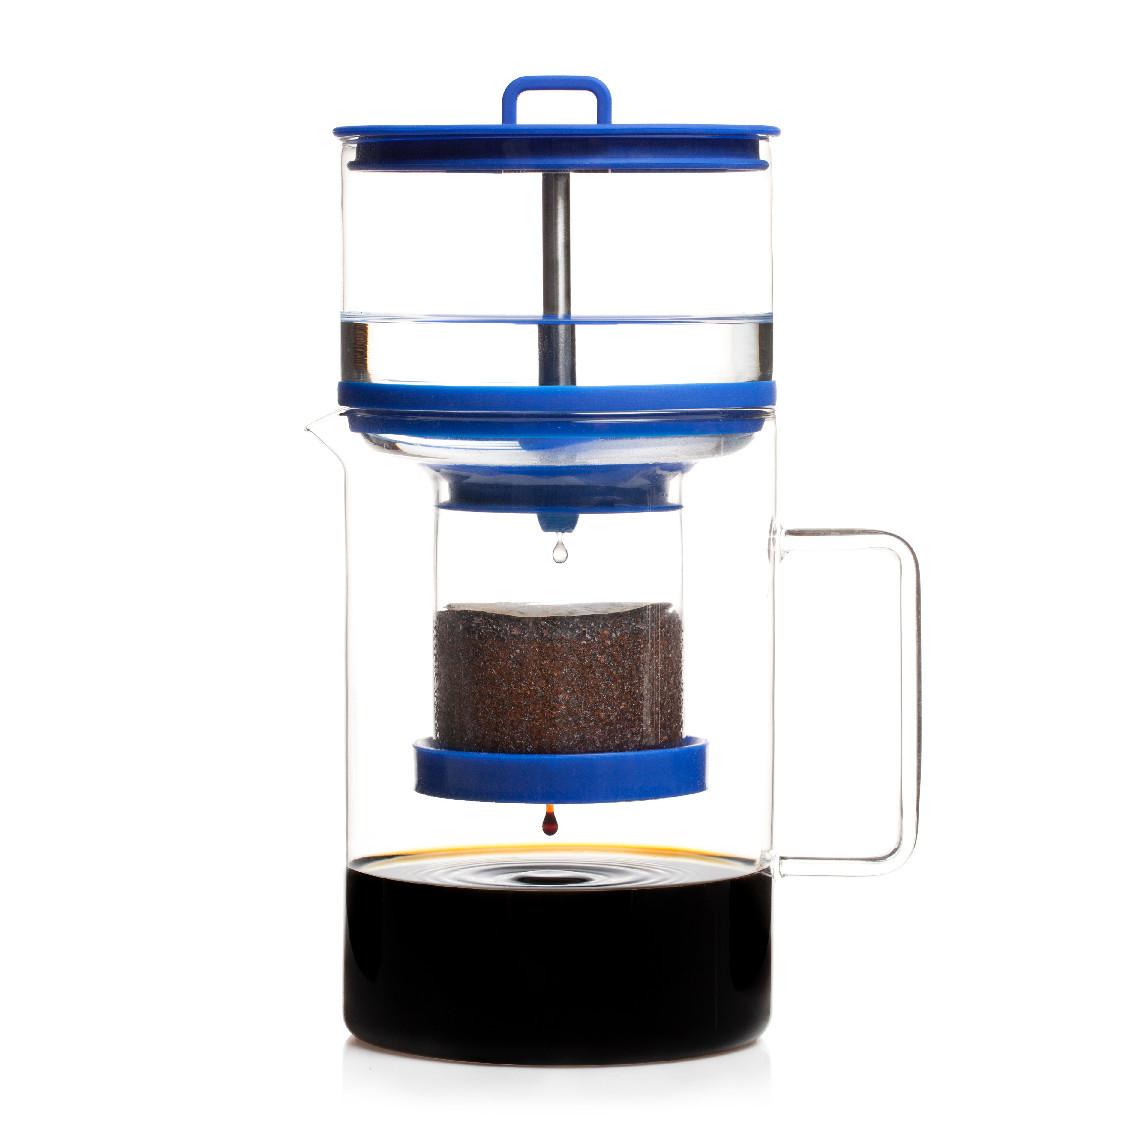 Bruer Cold Brew Coffee Maker